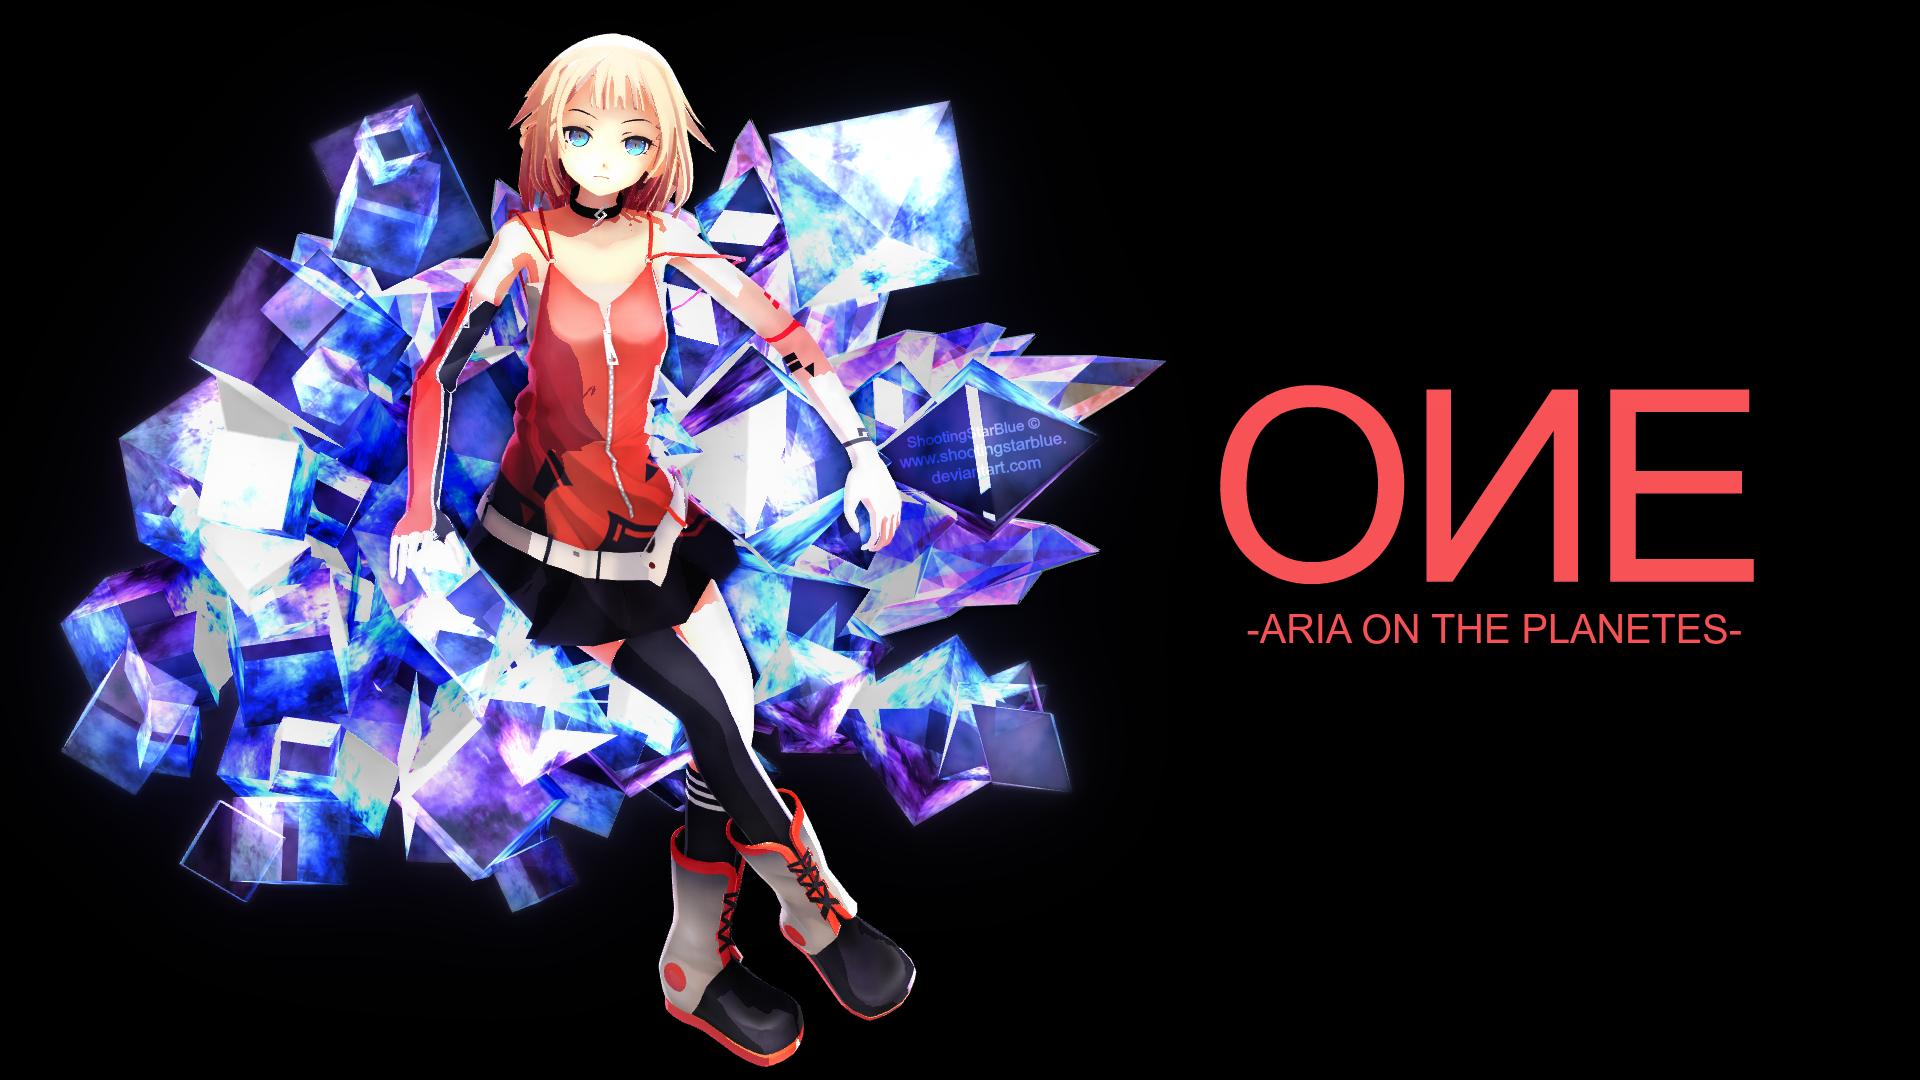 Aria - One